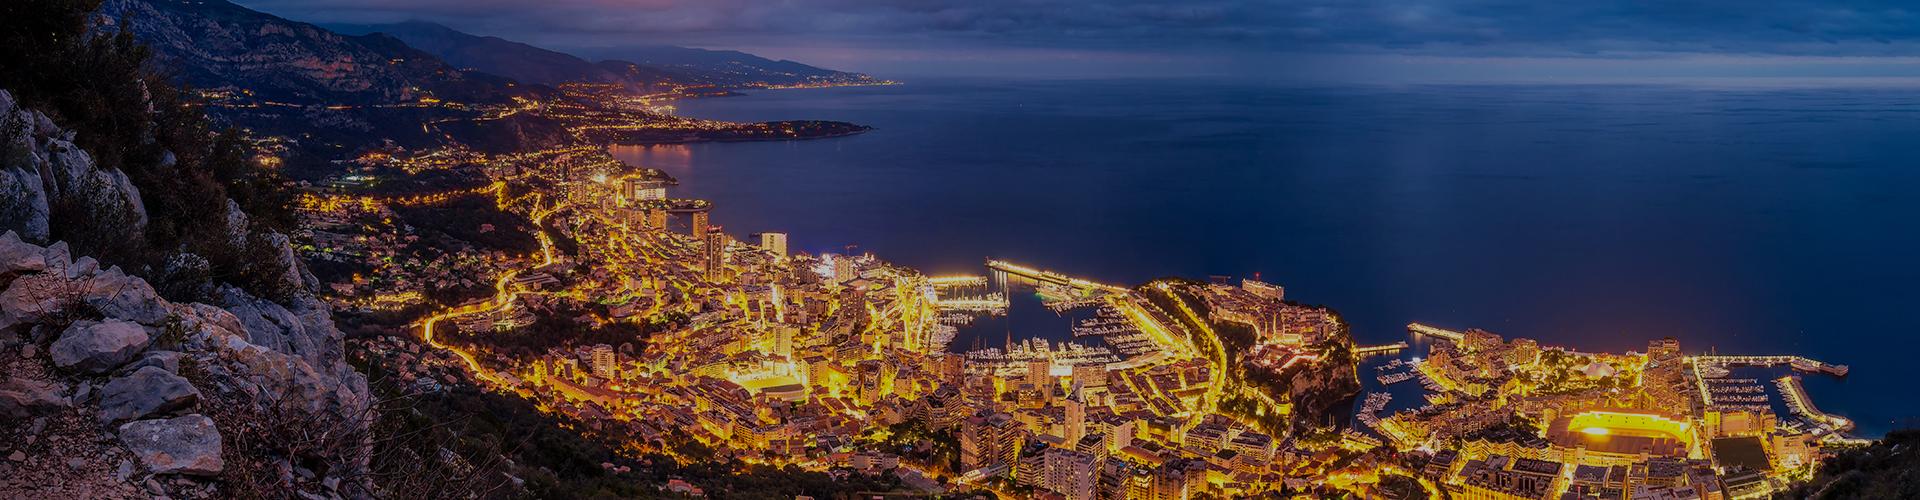 Landmark photograph of Monaco